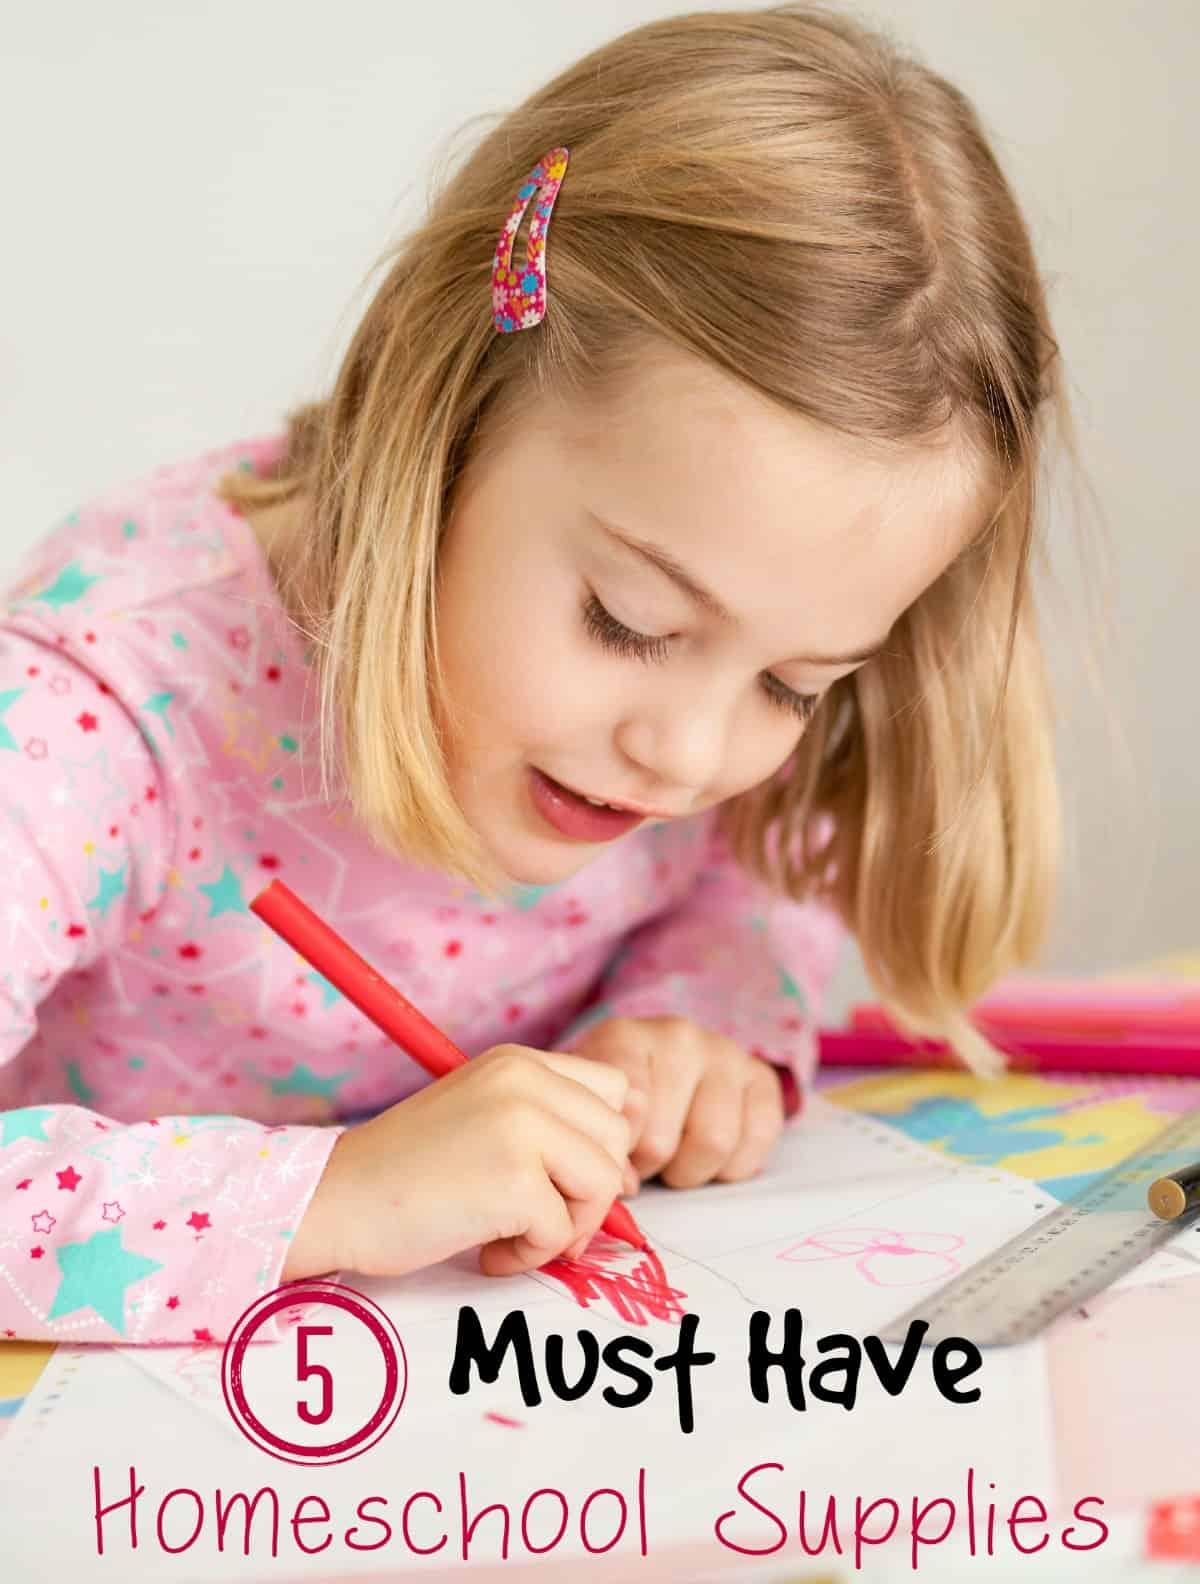 5 Must Have Homeschool Supplies